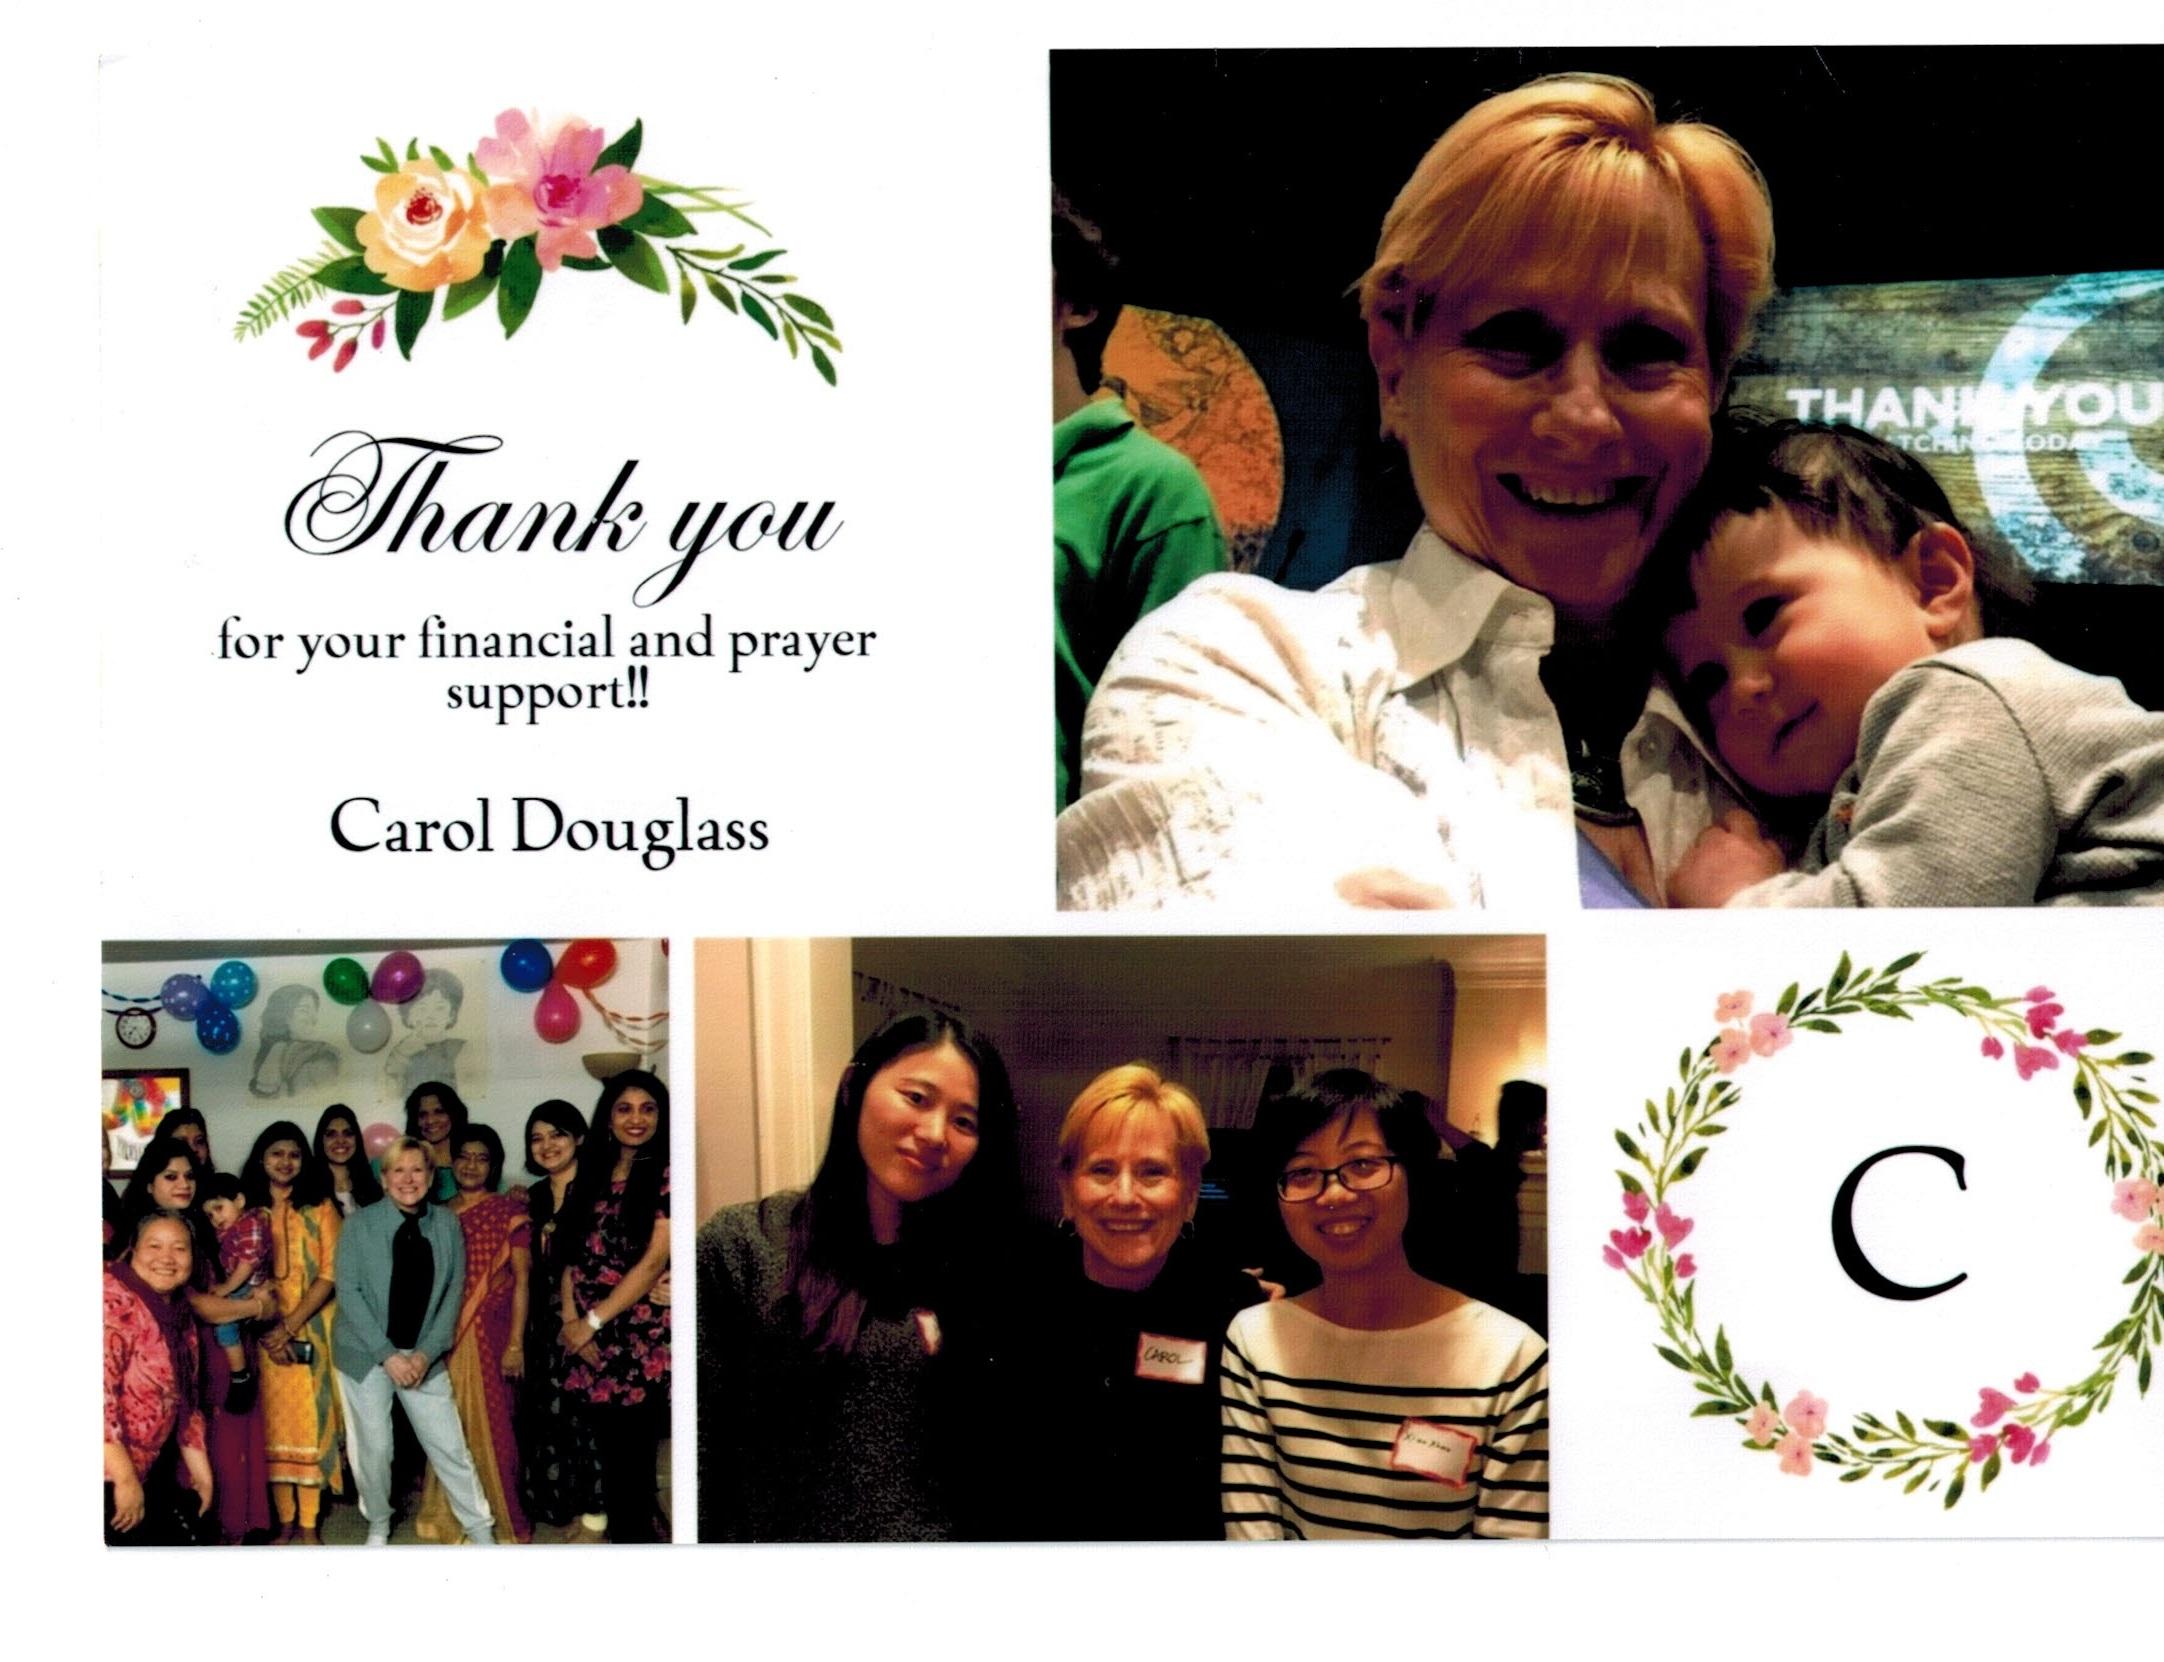 Carol%2BDouglas%2BInterntional%2BStudent%2BMIssionary05142019.jpg